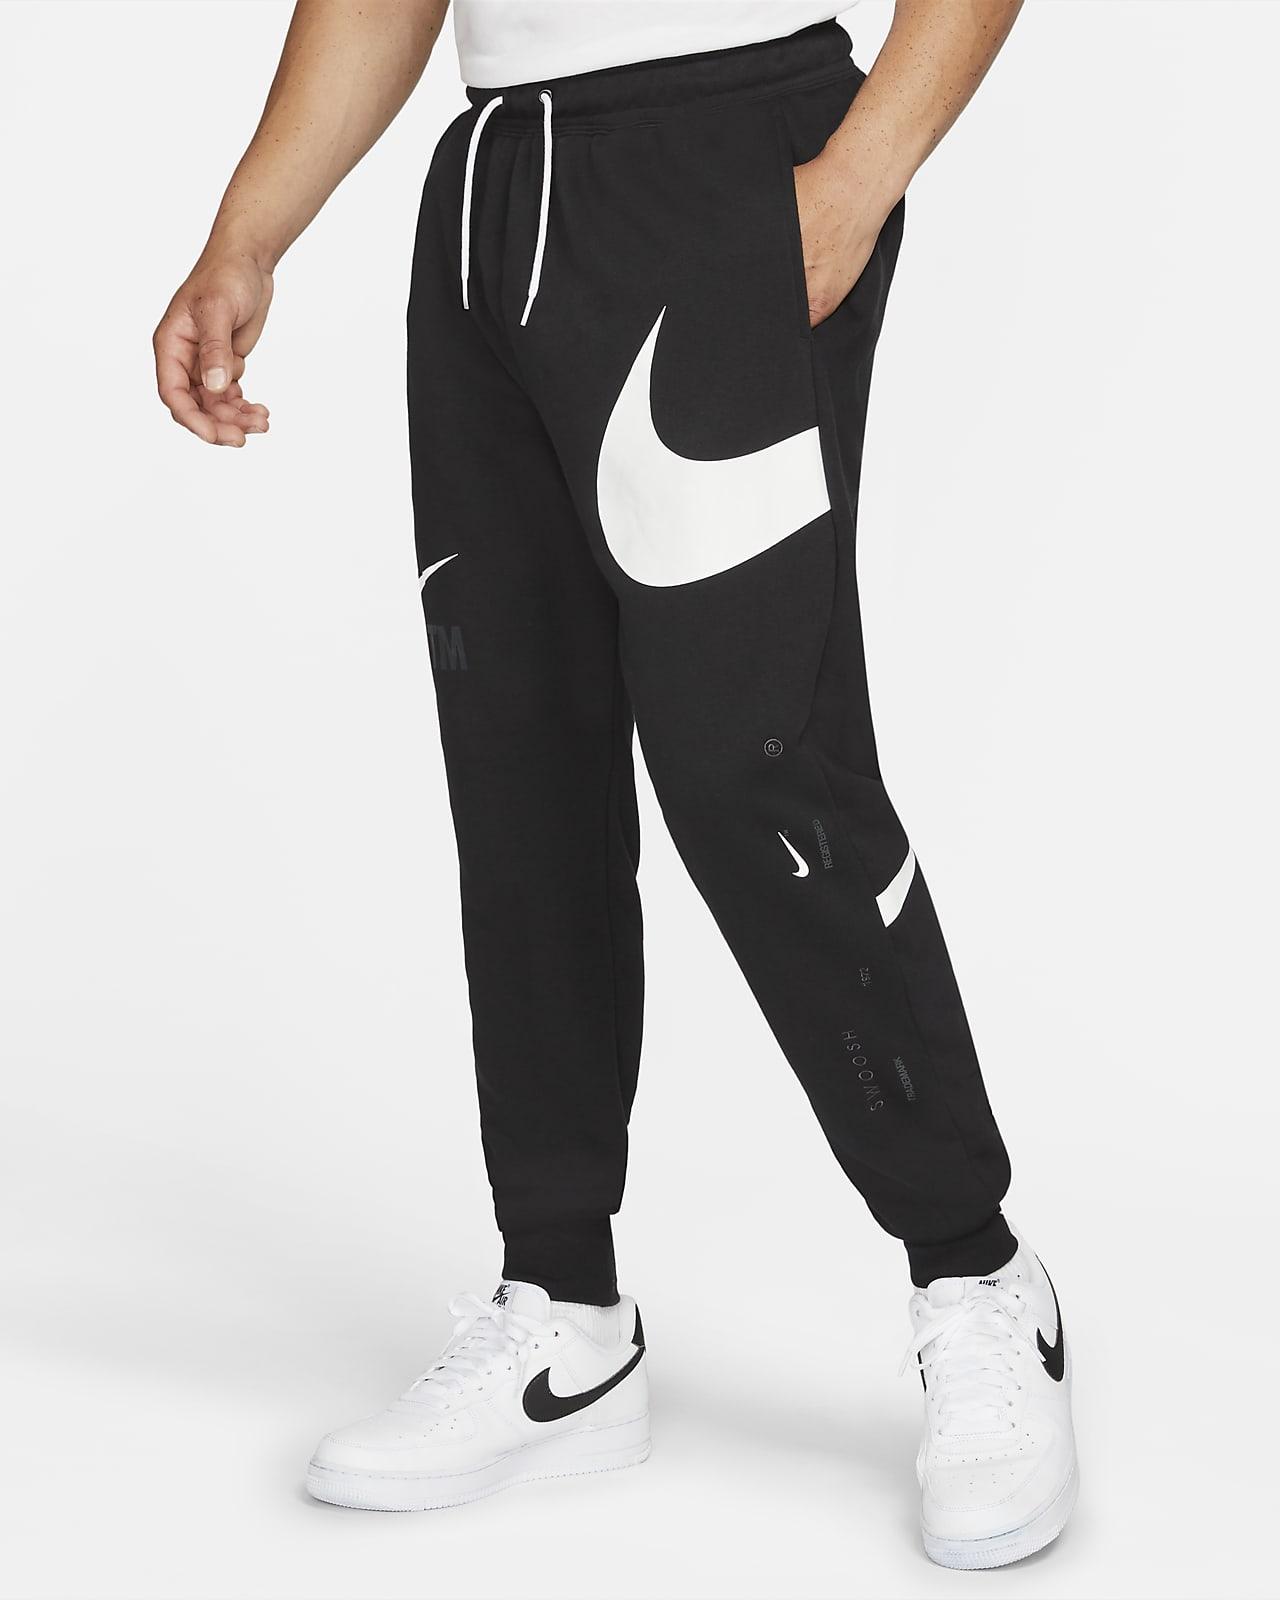 Pantaloni con rovescio semispazzolato Nike Sportswear Swoosh - Uomo